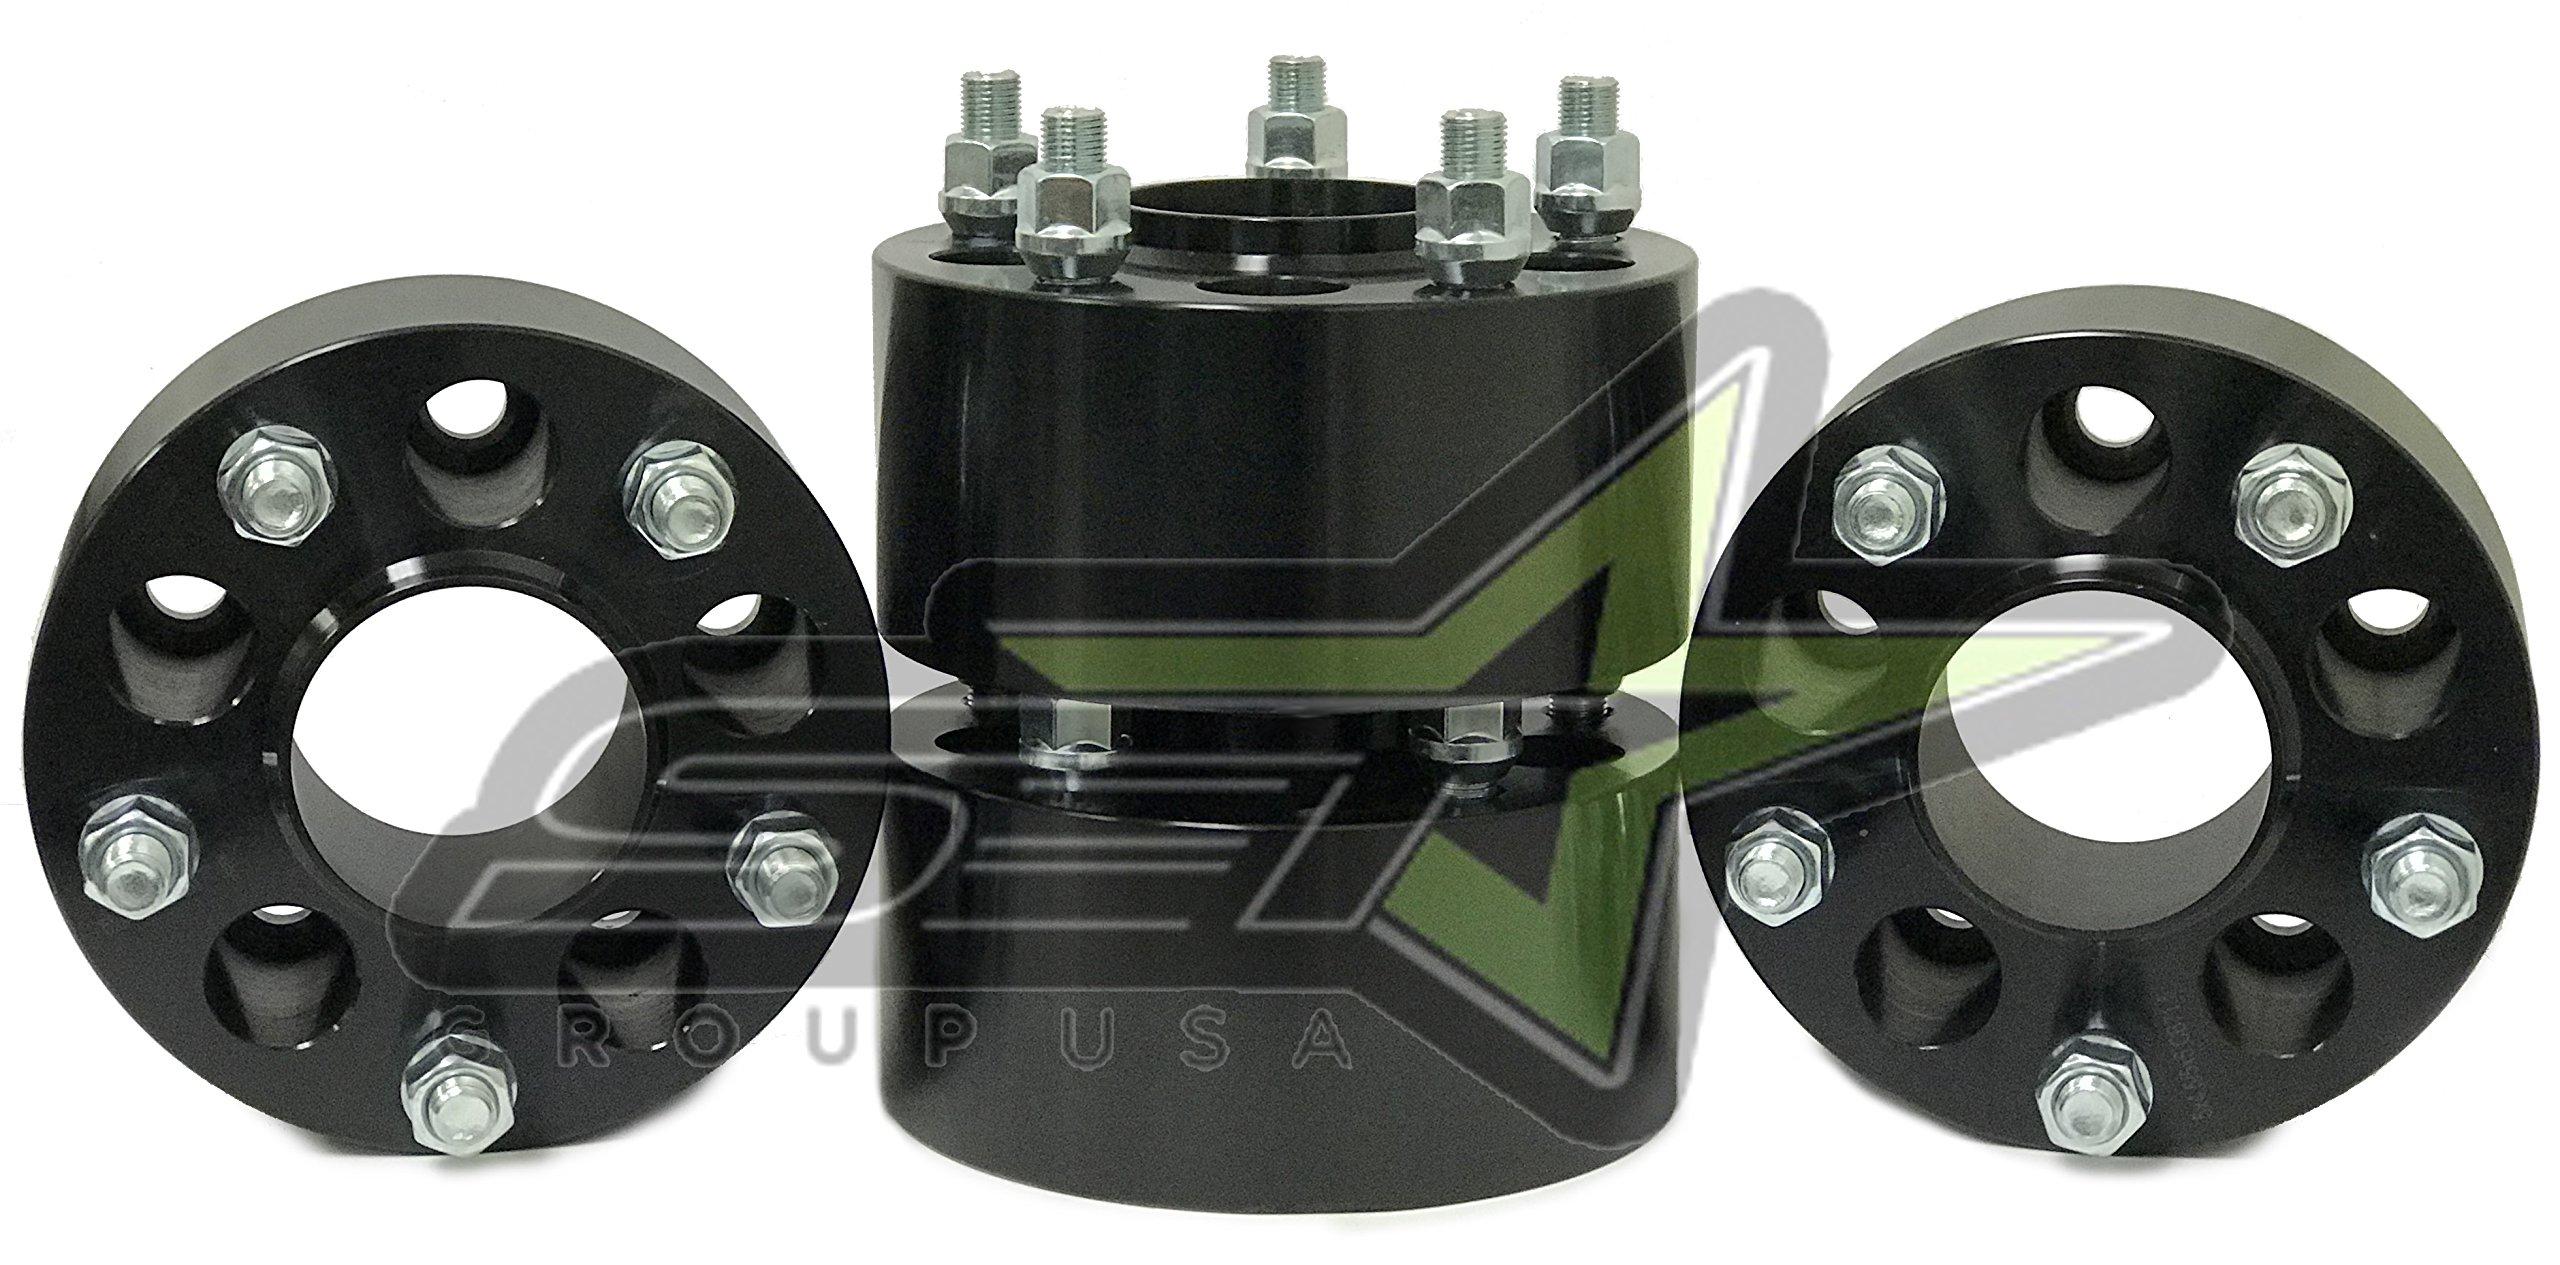 4 Black Jeep Wrangler Wheel Adapters 5x4.5 to 5x5 Hub Centric 3'' Inch Thick | Adapters JK Wheels onto Tj Yj Kk Sj Xj | 1/2-20 Studs | 71.5mm Center Bore